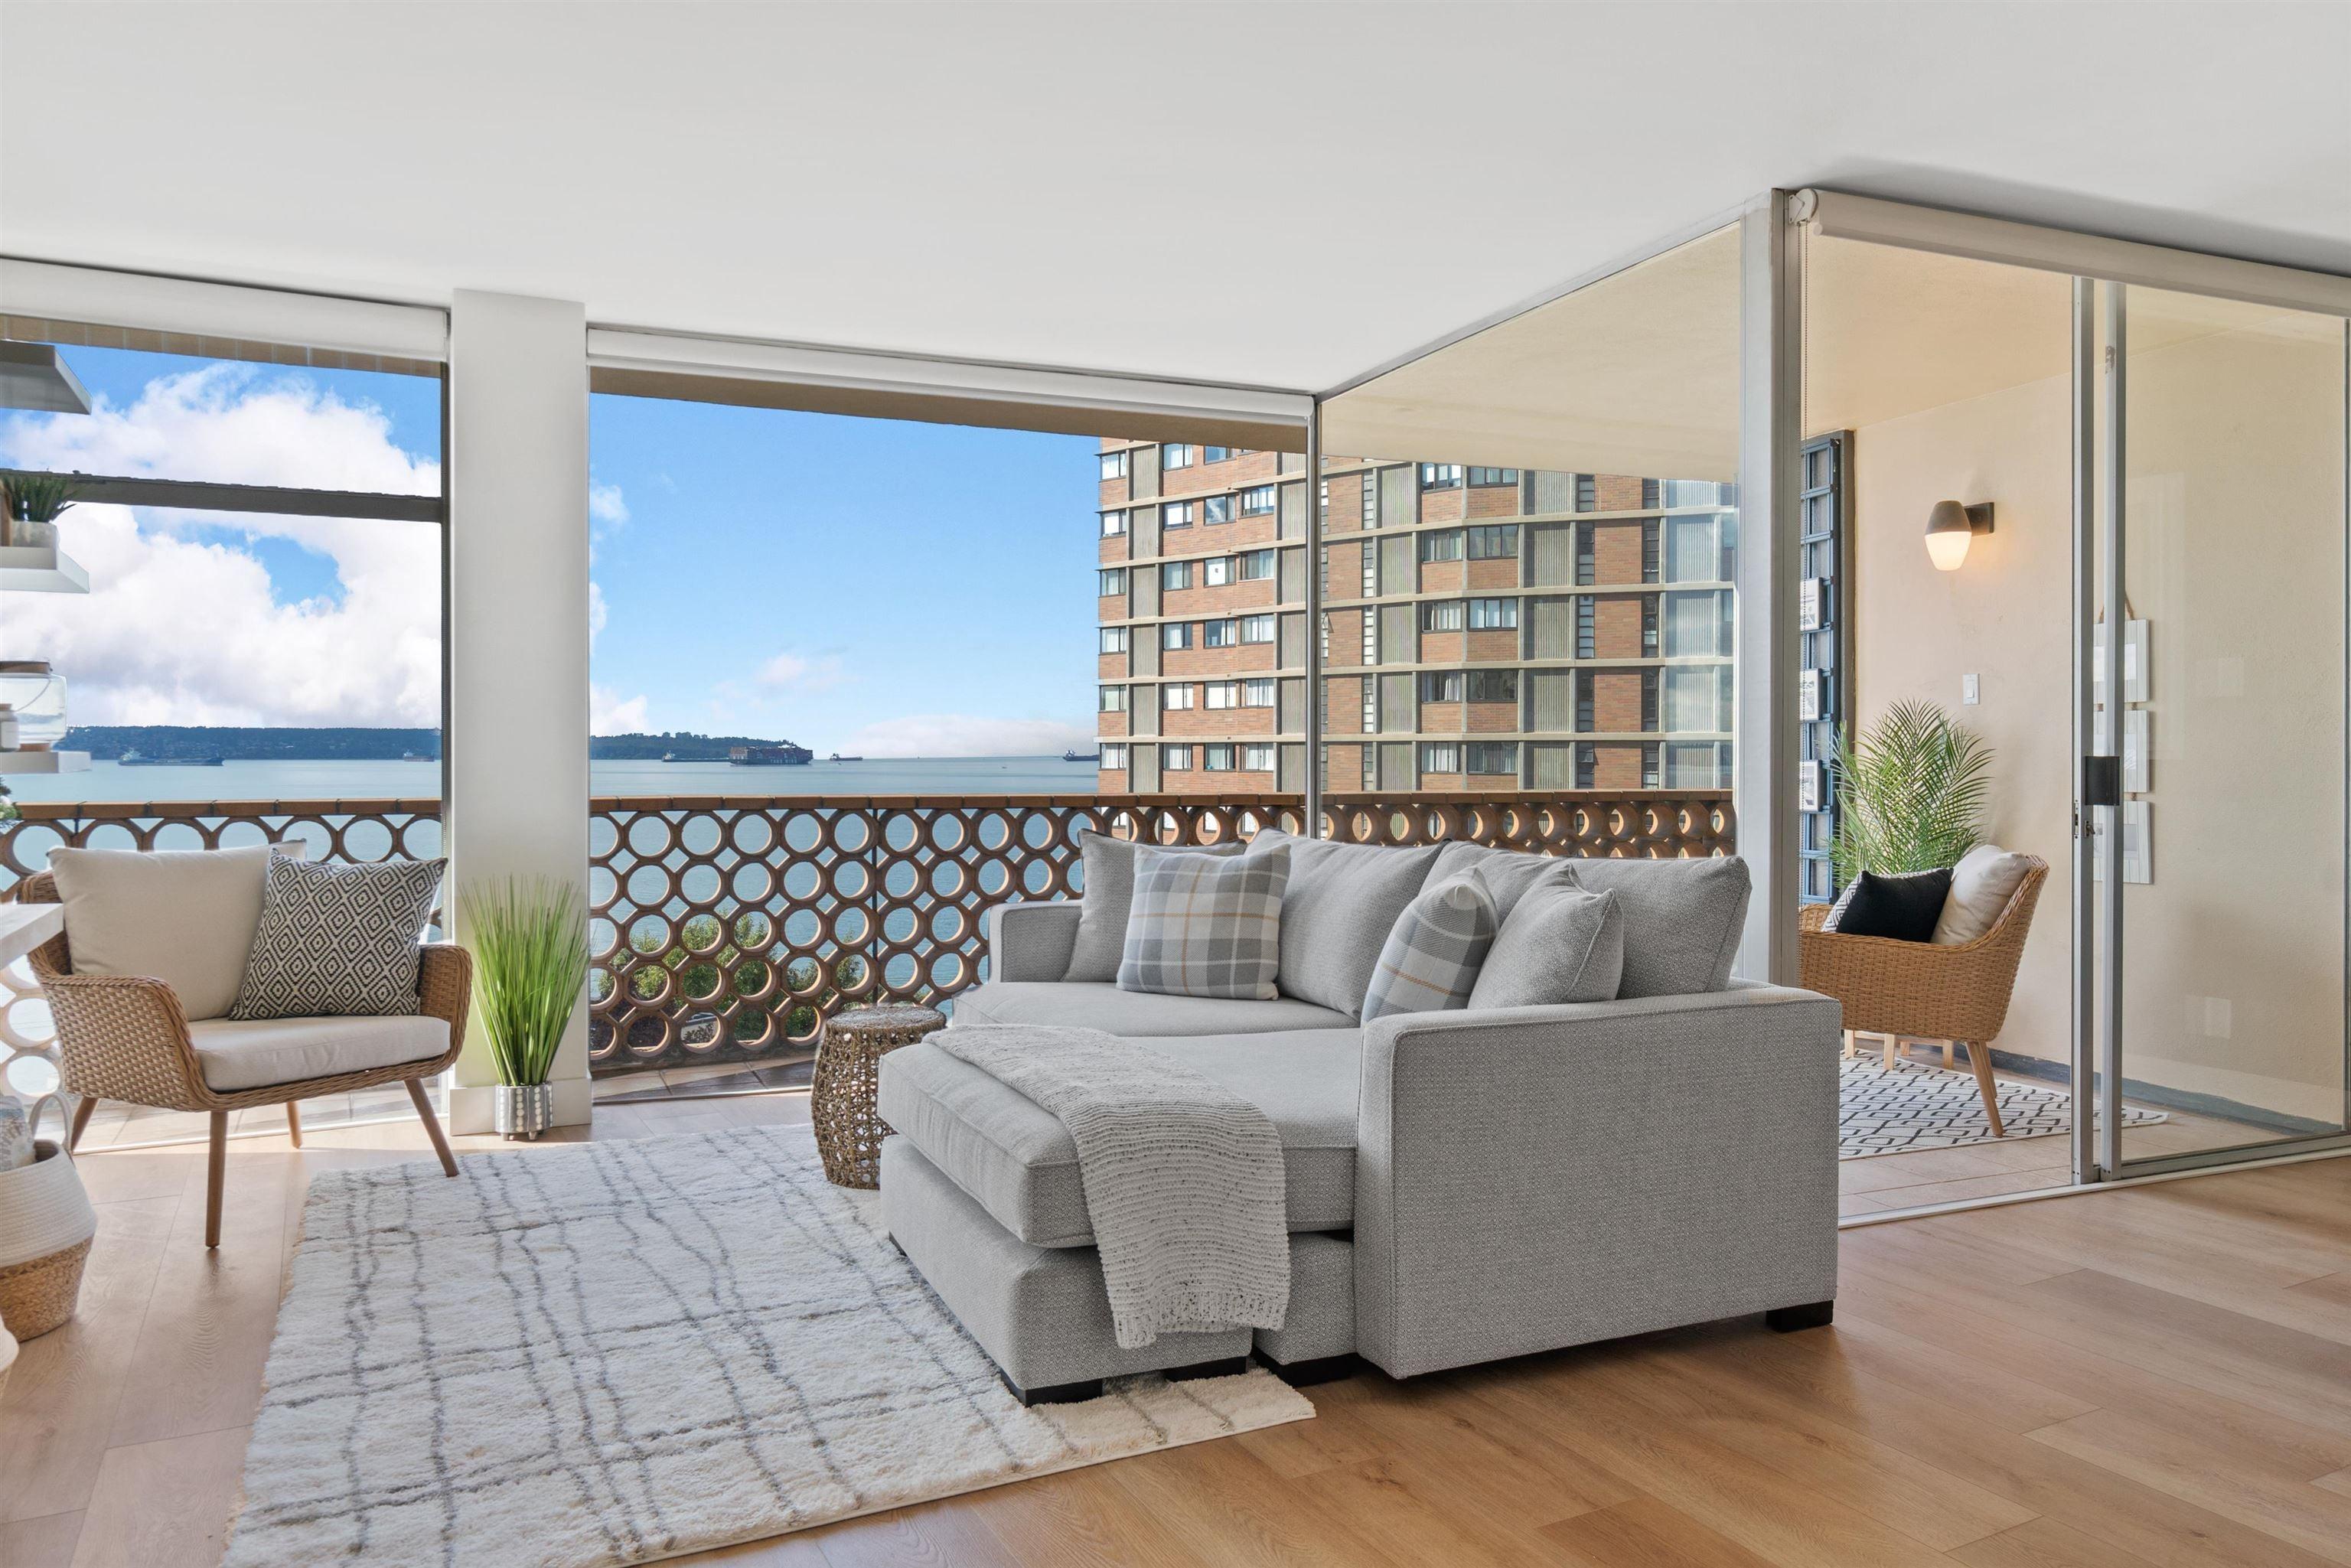 504 2135 ARGYLE AVENUE - Dundarave Apartment/Condo for sale, 1 Bedroom (R2626841) - #1